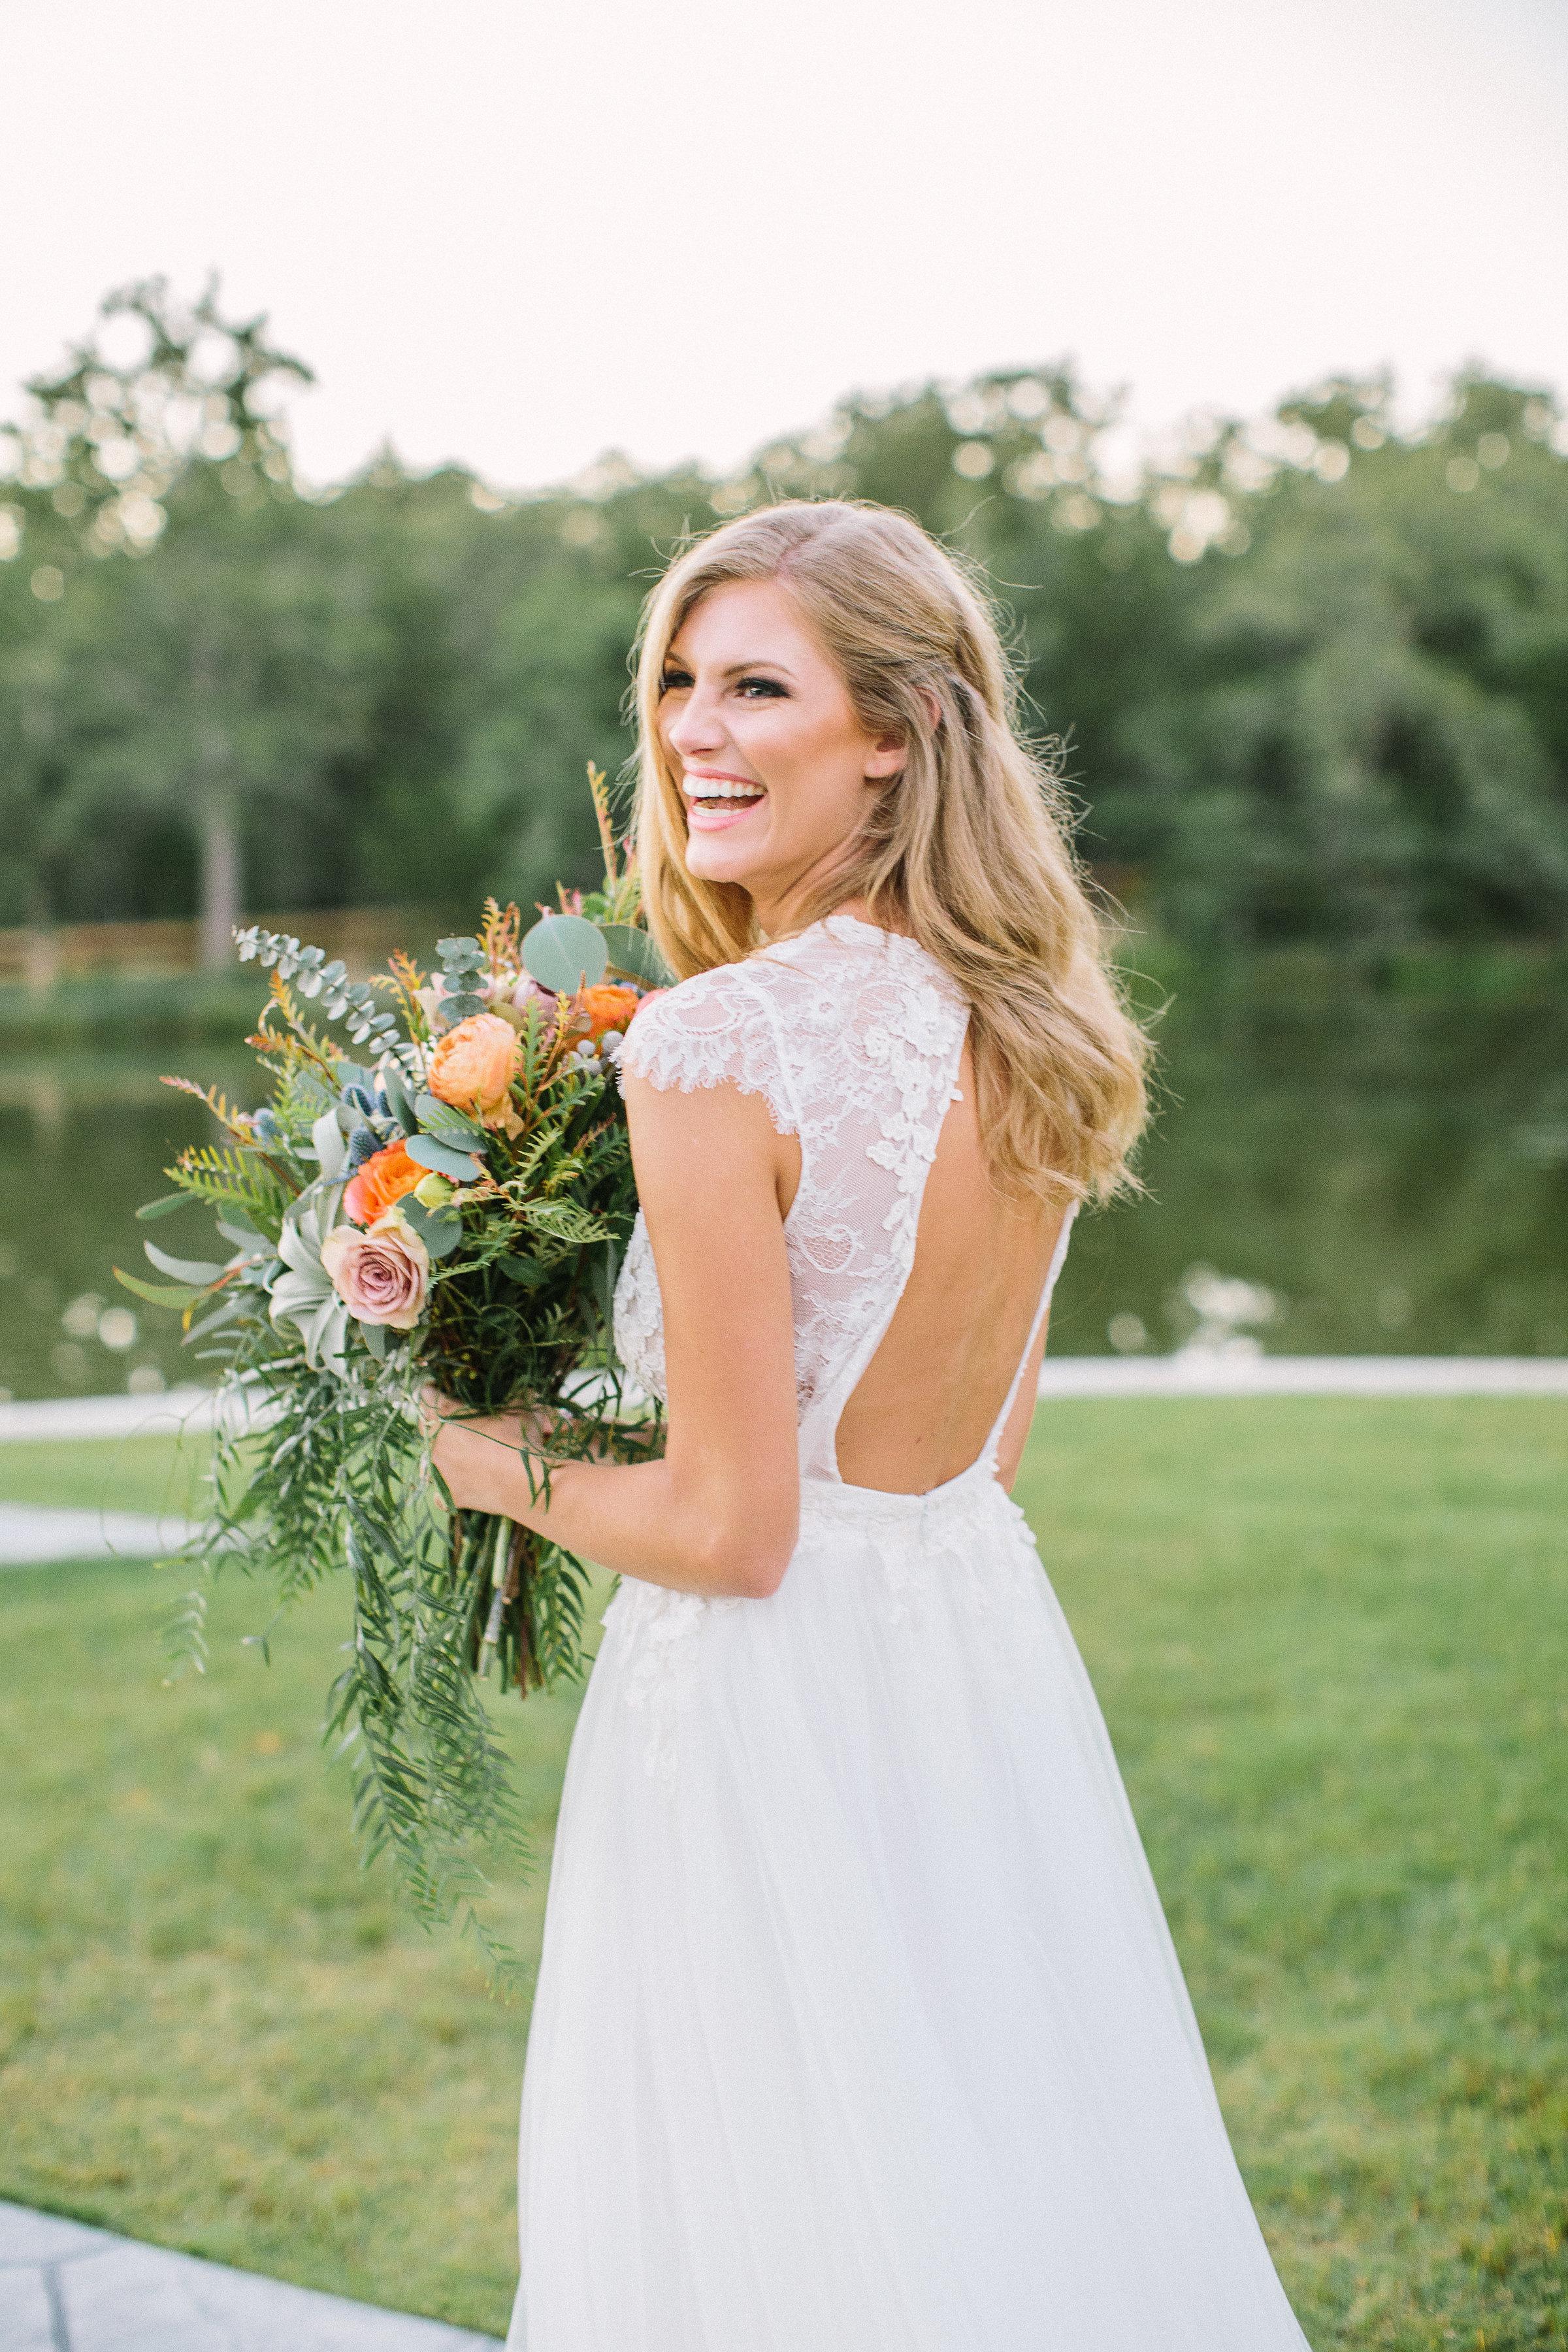 Ellen-Ashton-Photography-Peach-Creek-Ranch-Weddings-Wed-and-Prosper390